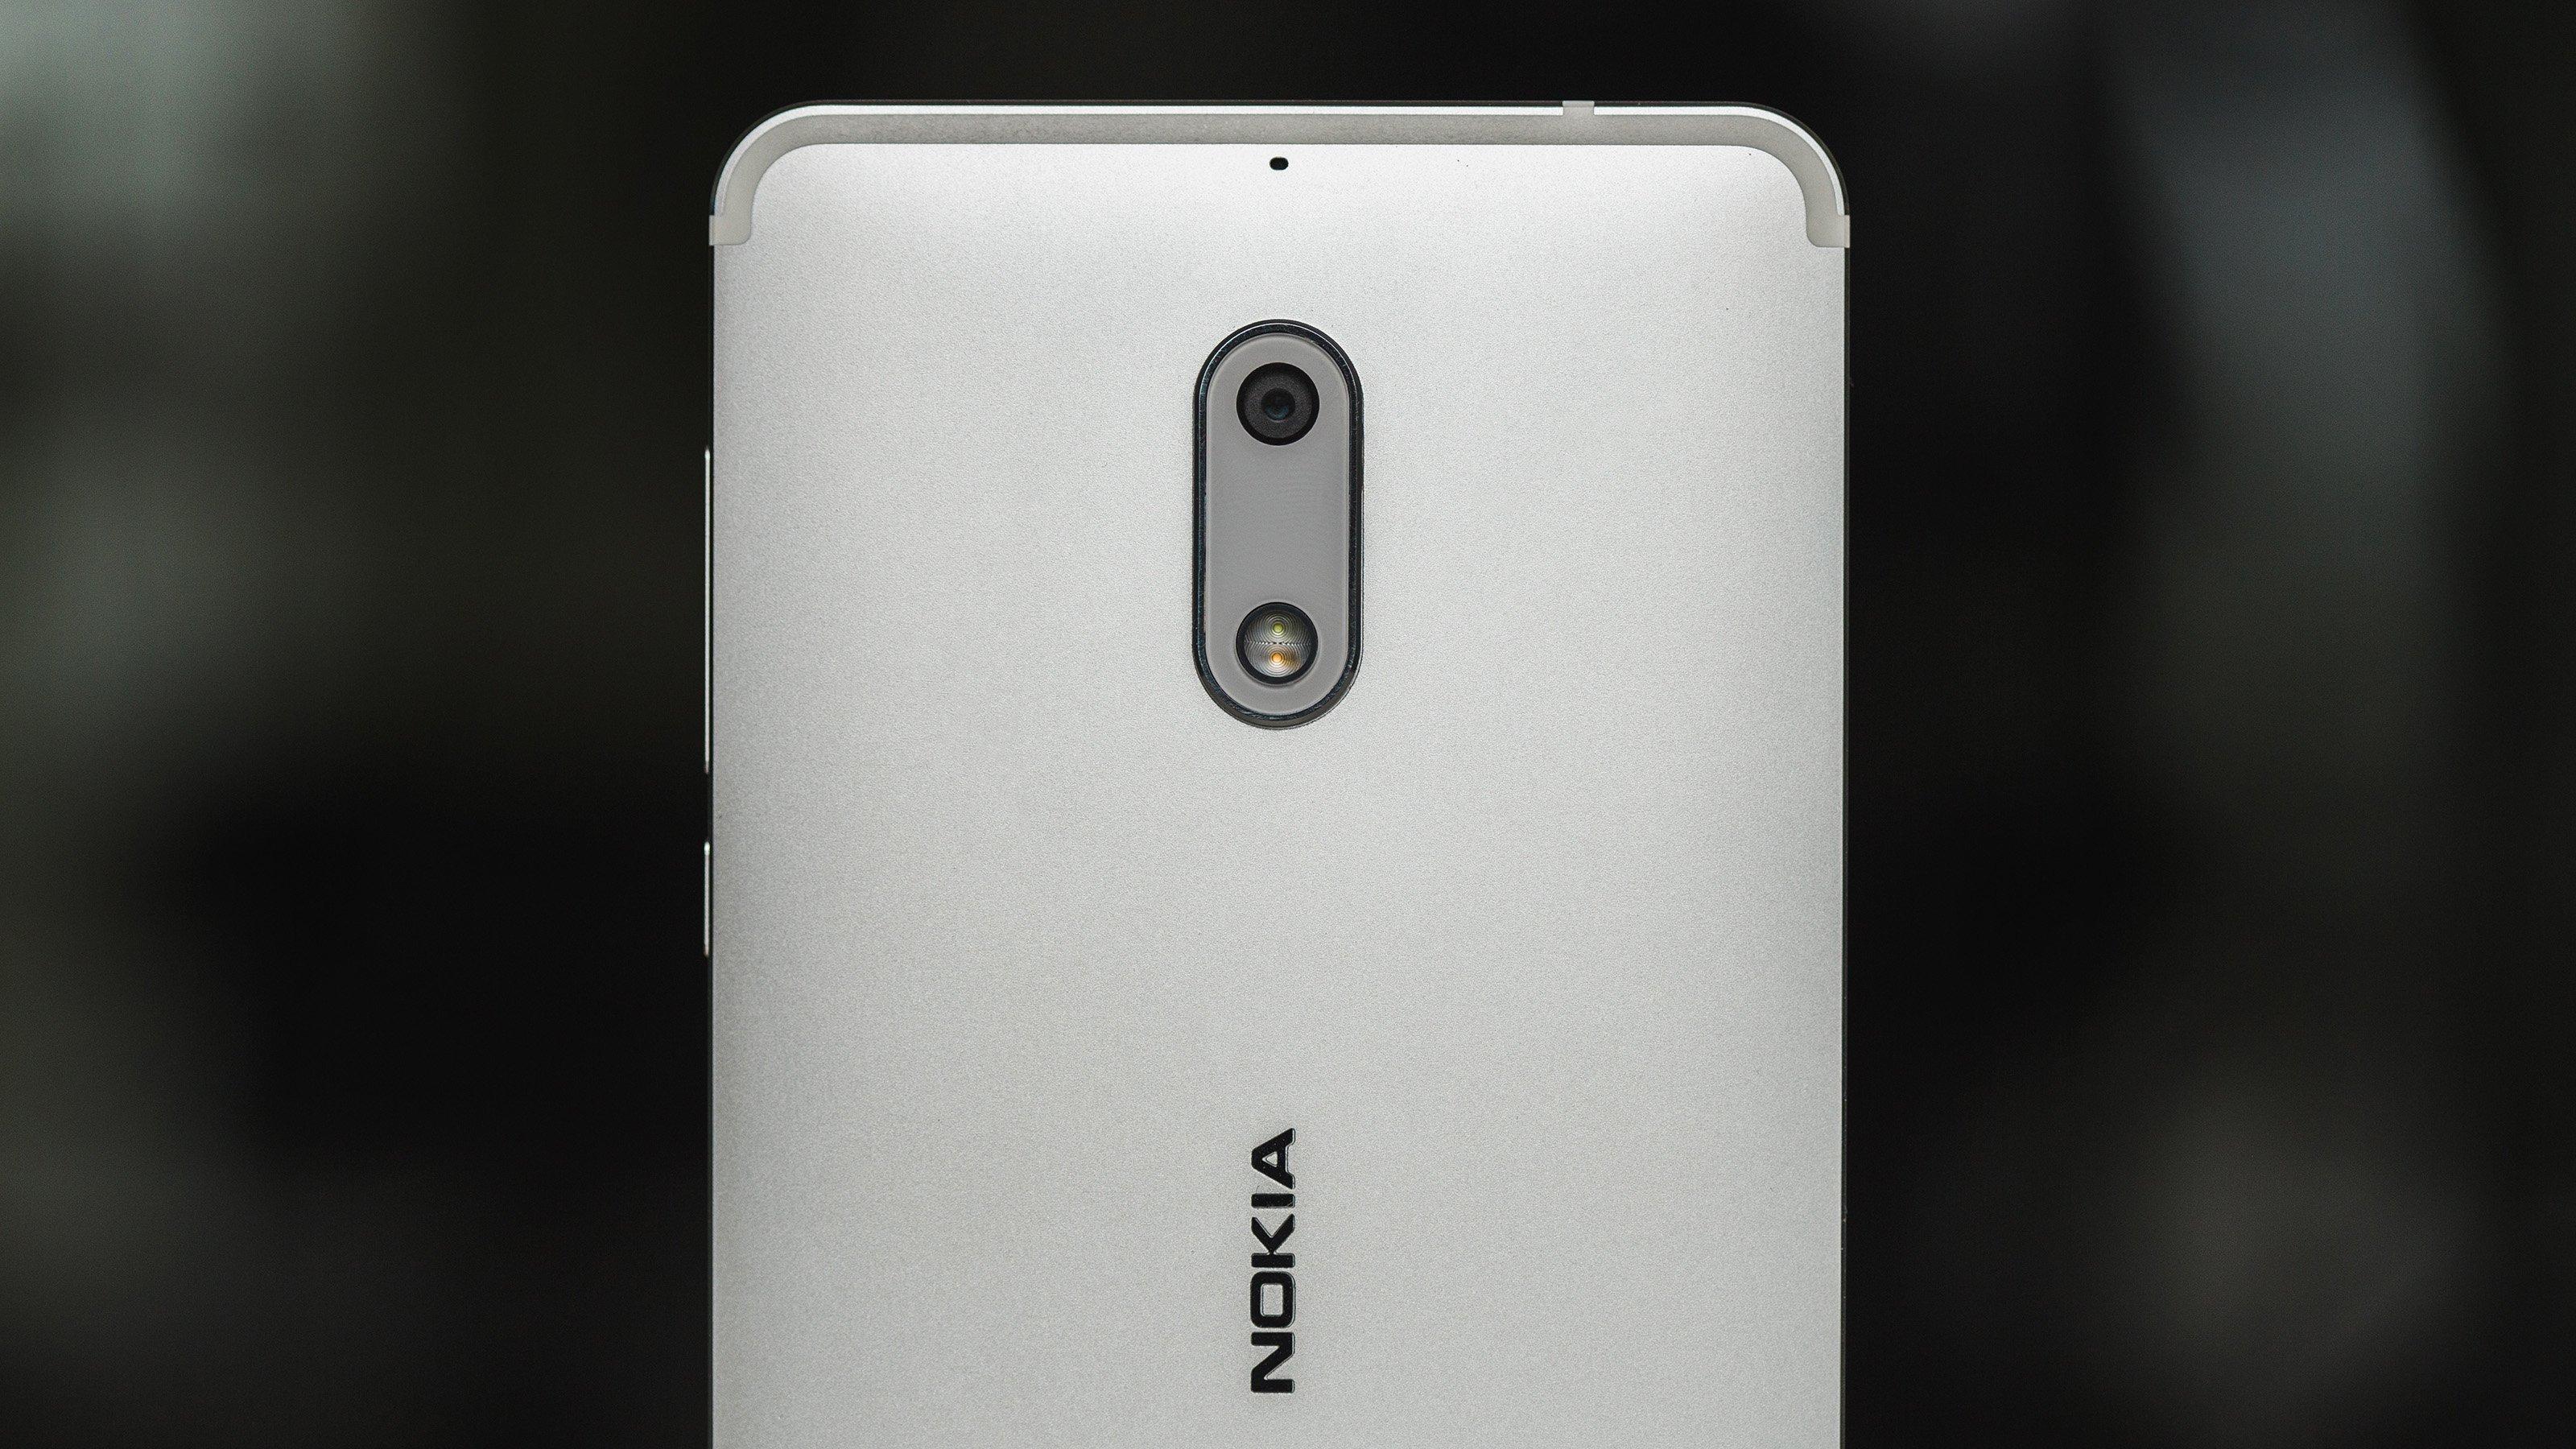 Nokia 6 review: HMD Global isn't strutting its stuff yet